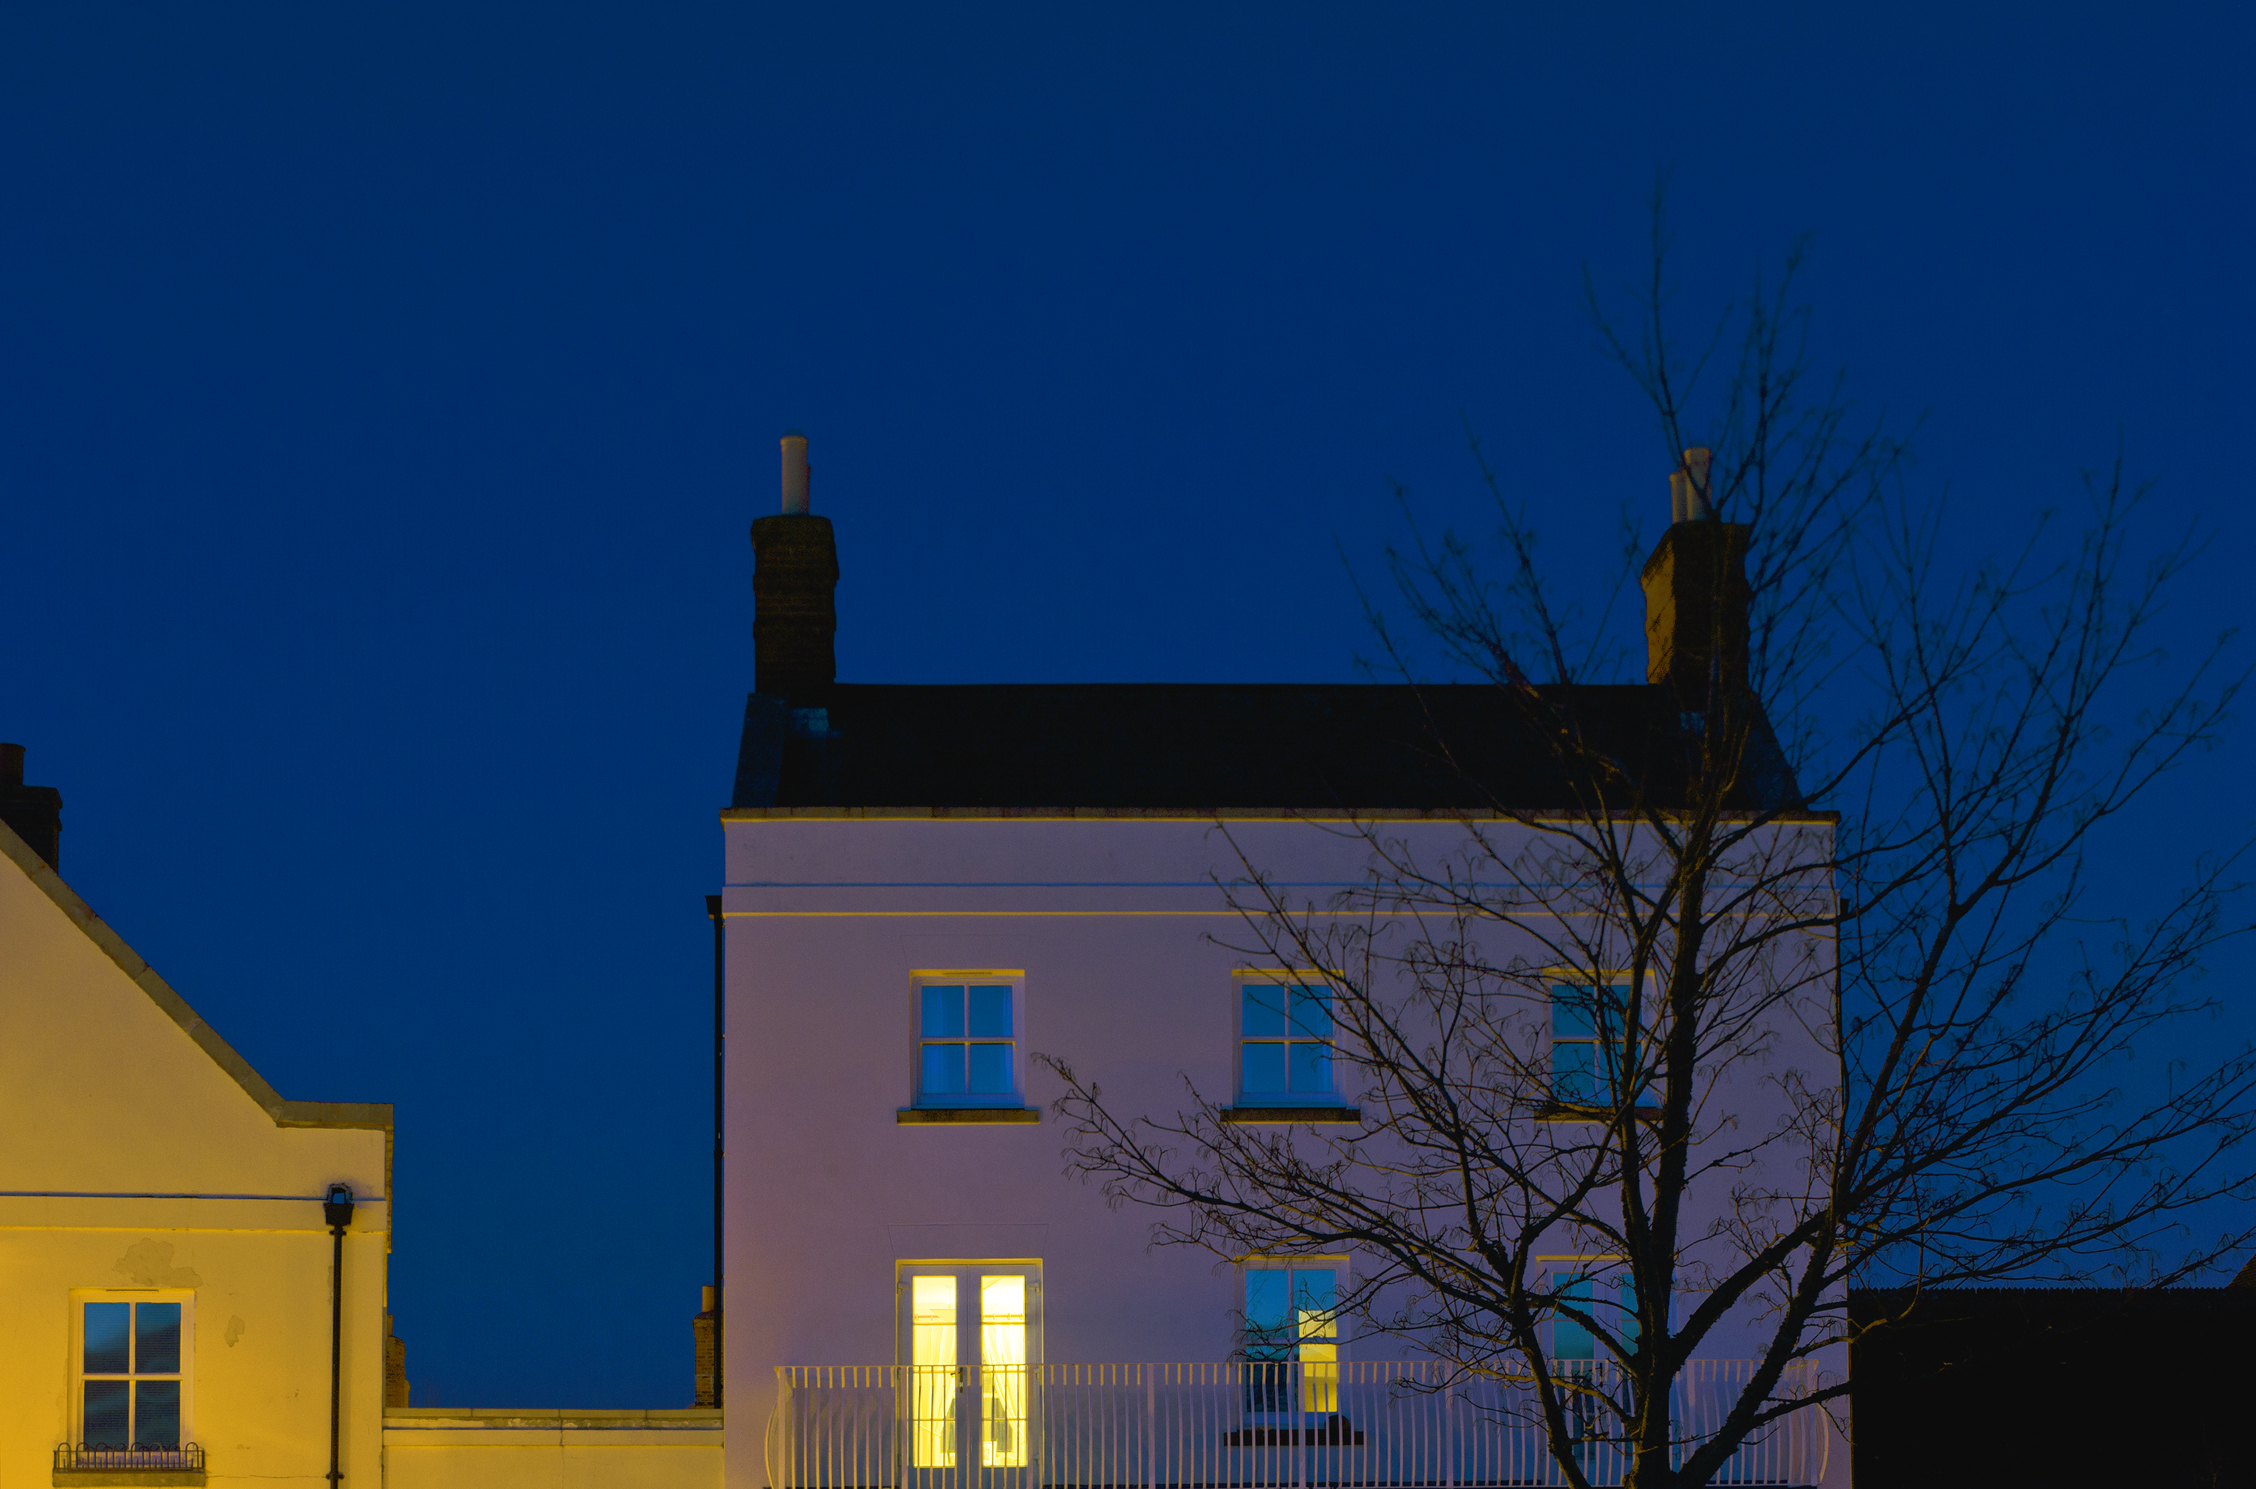 Night Windows 16 - Judith Jones - Celeste Prize 2012 - Artwork ...